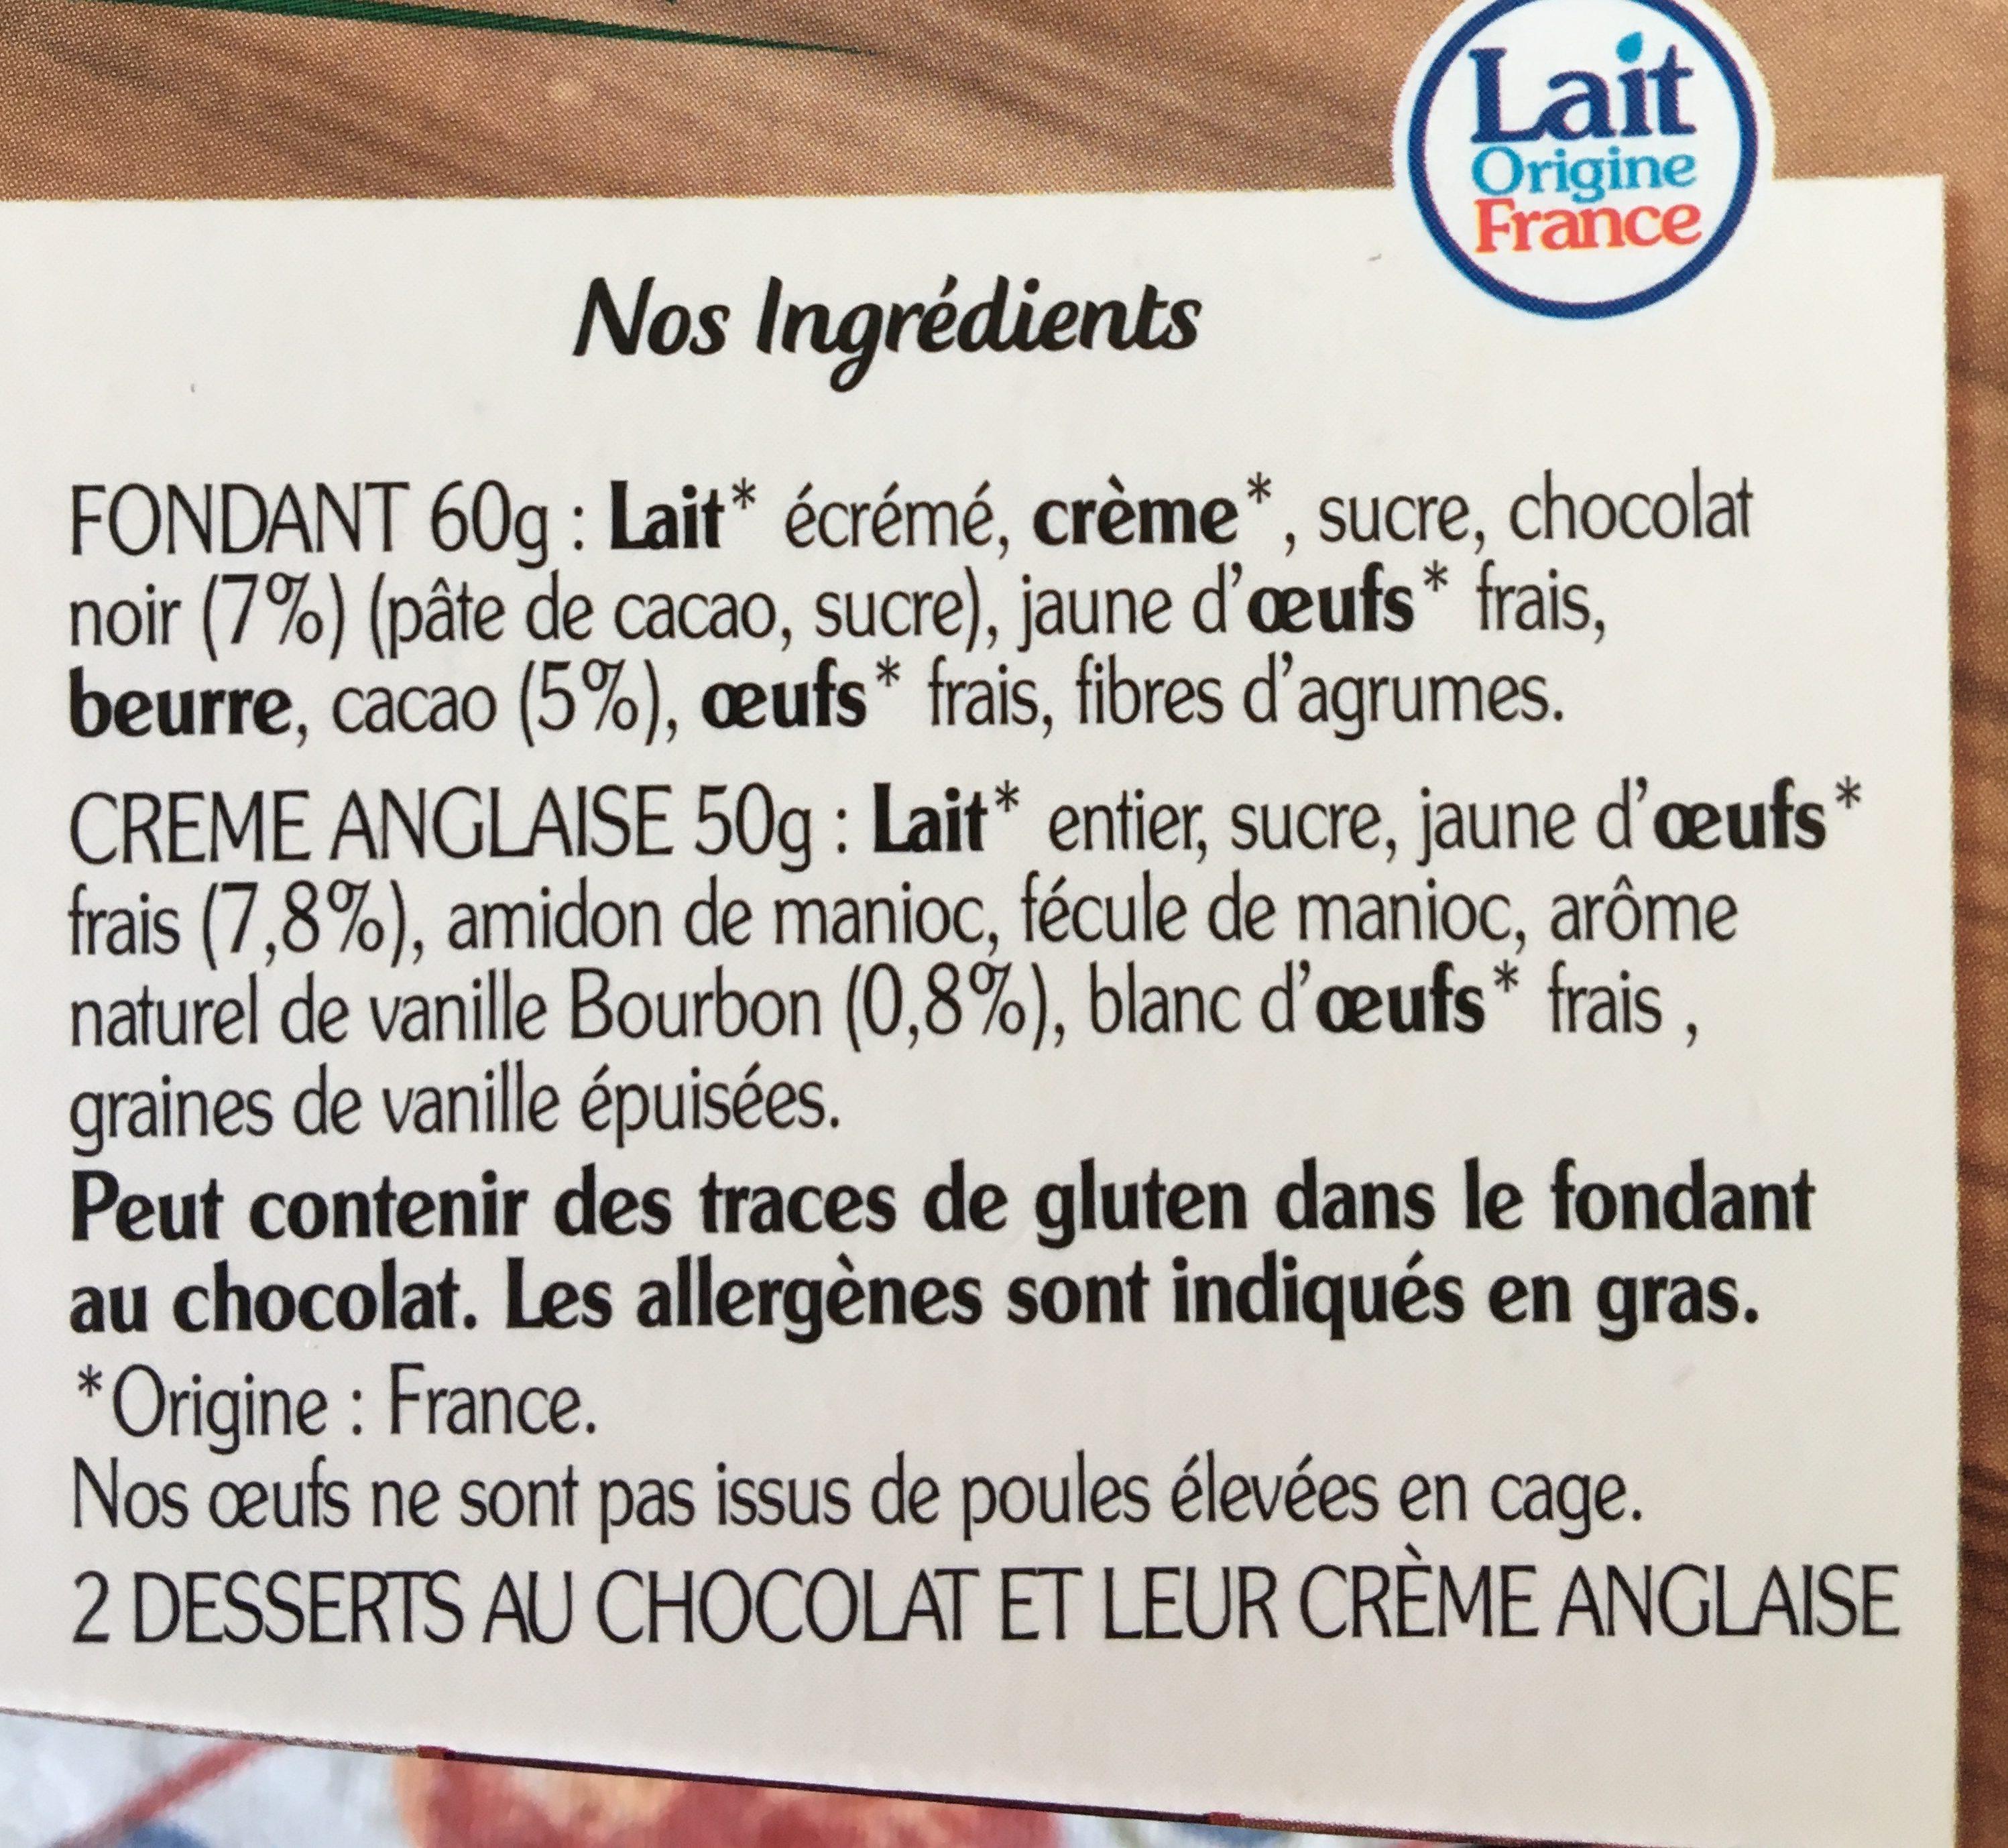 Le fondant au chocolat noir - Ingrediënten - fr